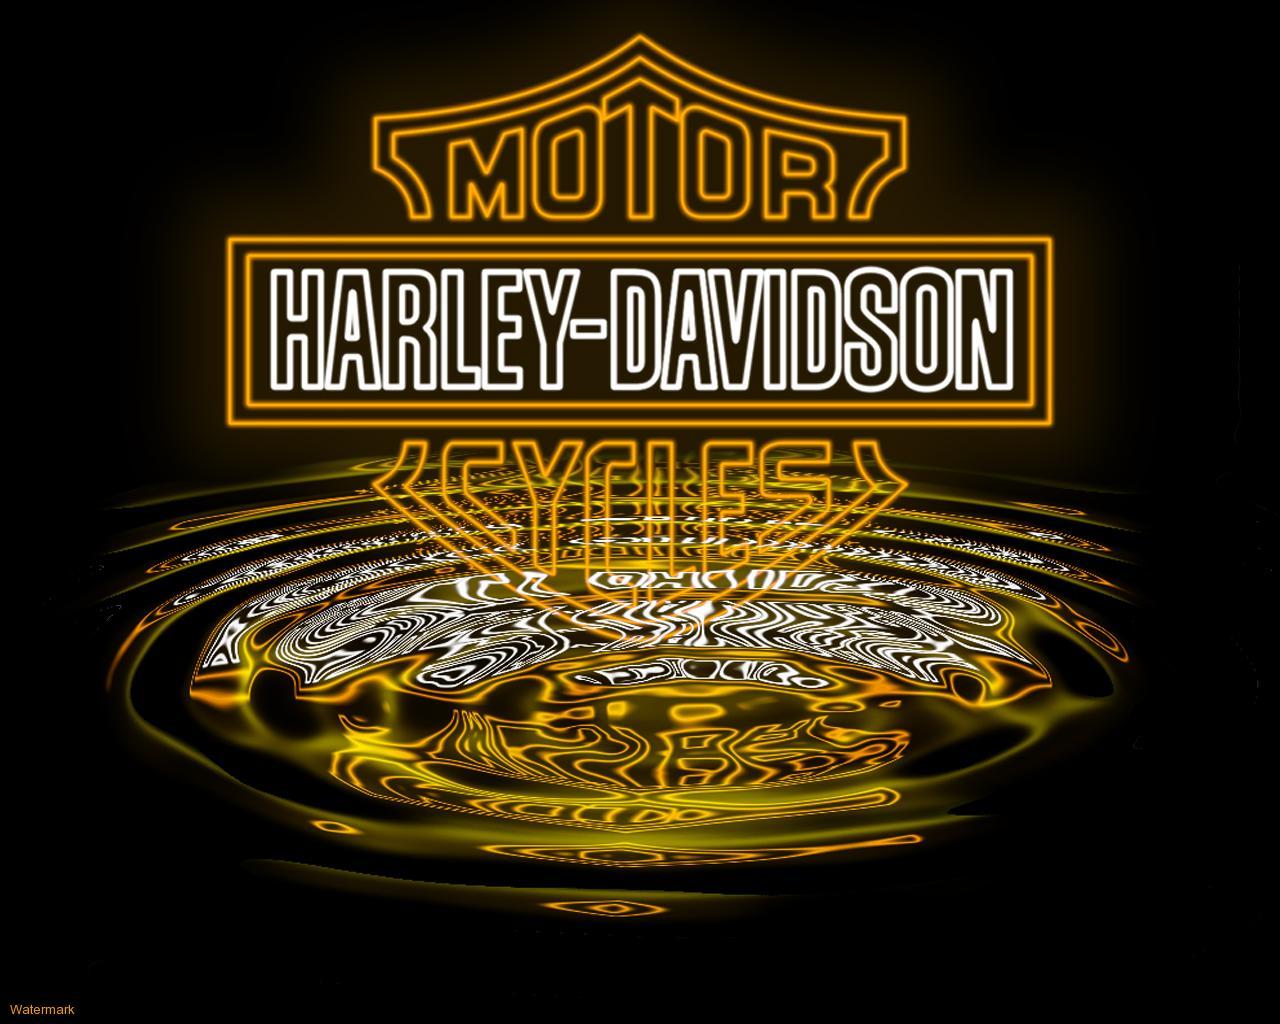 Harley Davidson Logo Wallpaper 6933 Hd Wallpapers in Logos   Imagesci 1280x1024